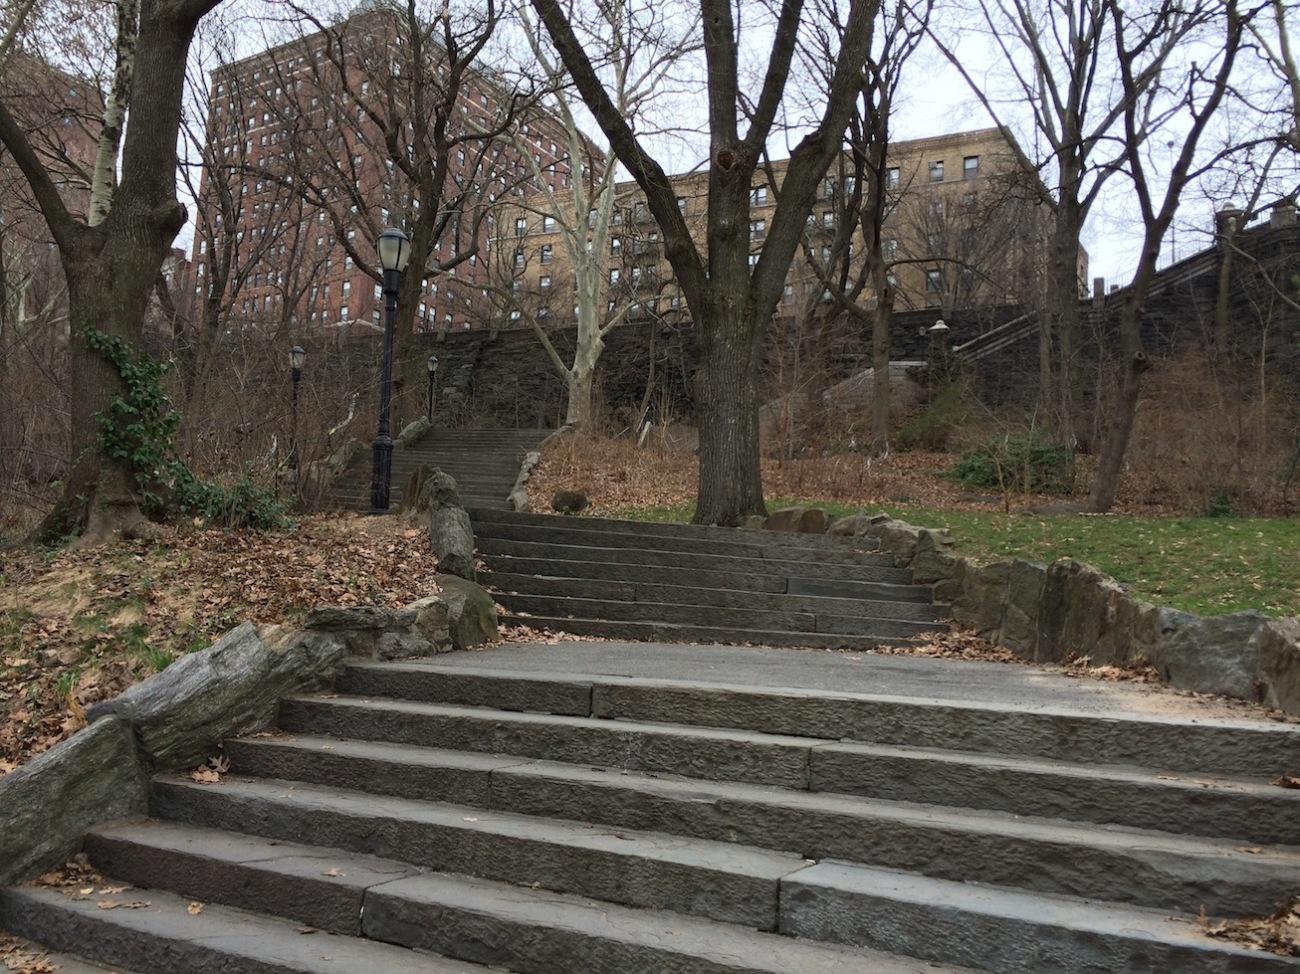 Morningside Park Stair Workout 2